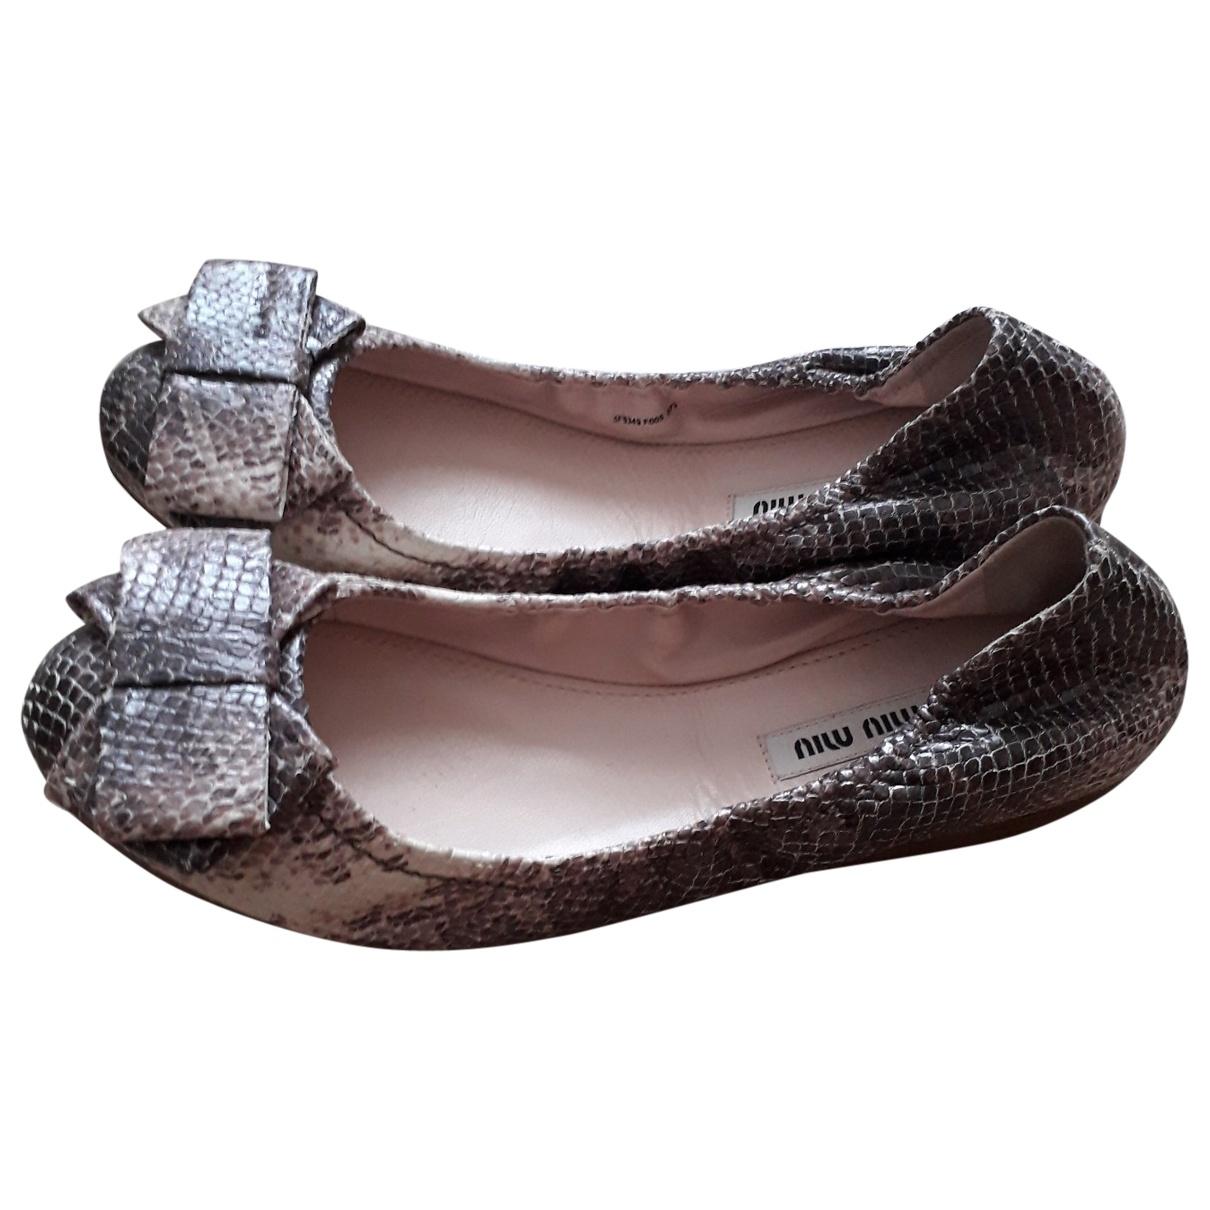 Miu Miu \N Beige Python Ballet flats for Women 37.5 EU